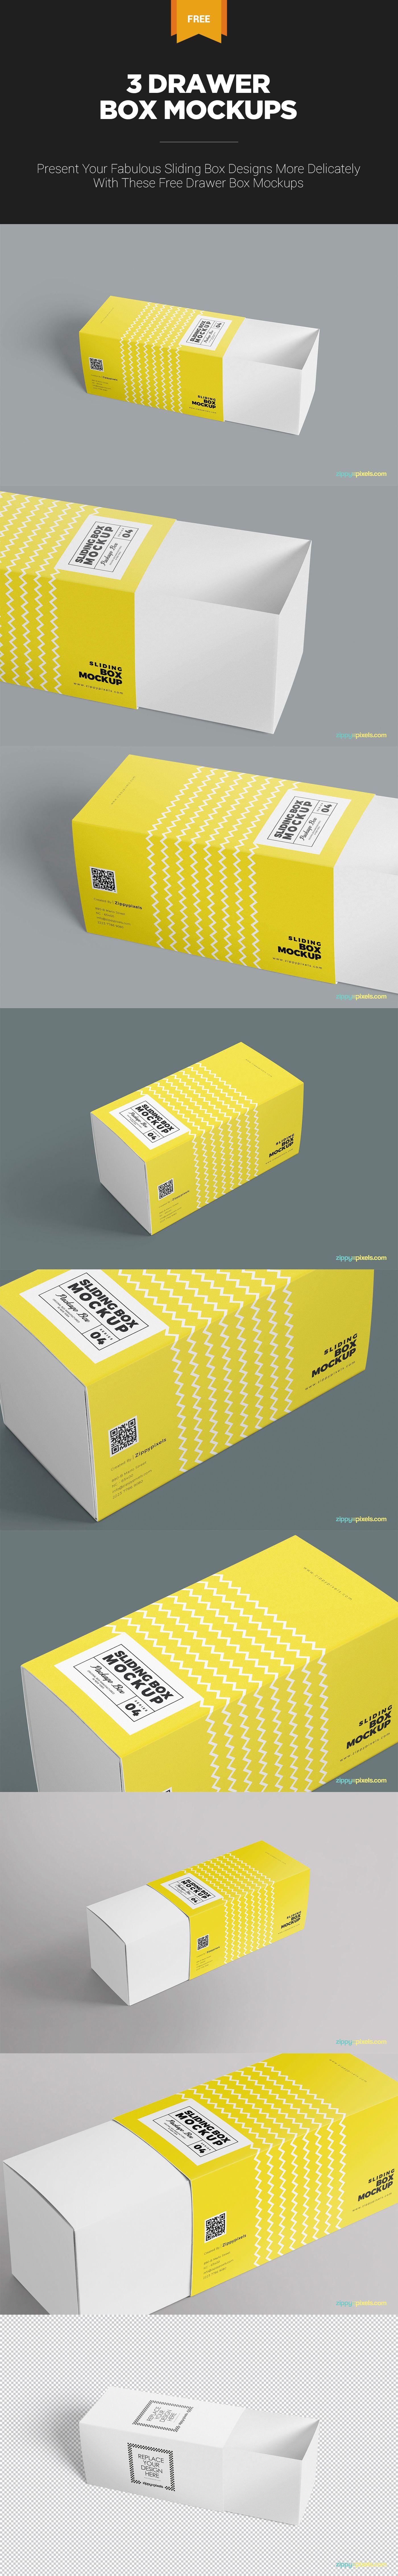 Download 3 Free Cardboard Drawer Box Mockups Zippypixels Box Mockup Slide Box Mockup